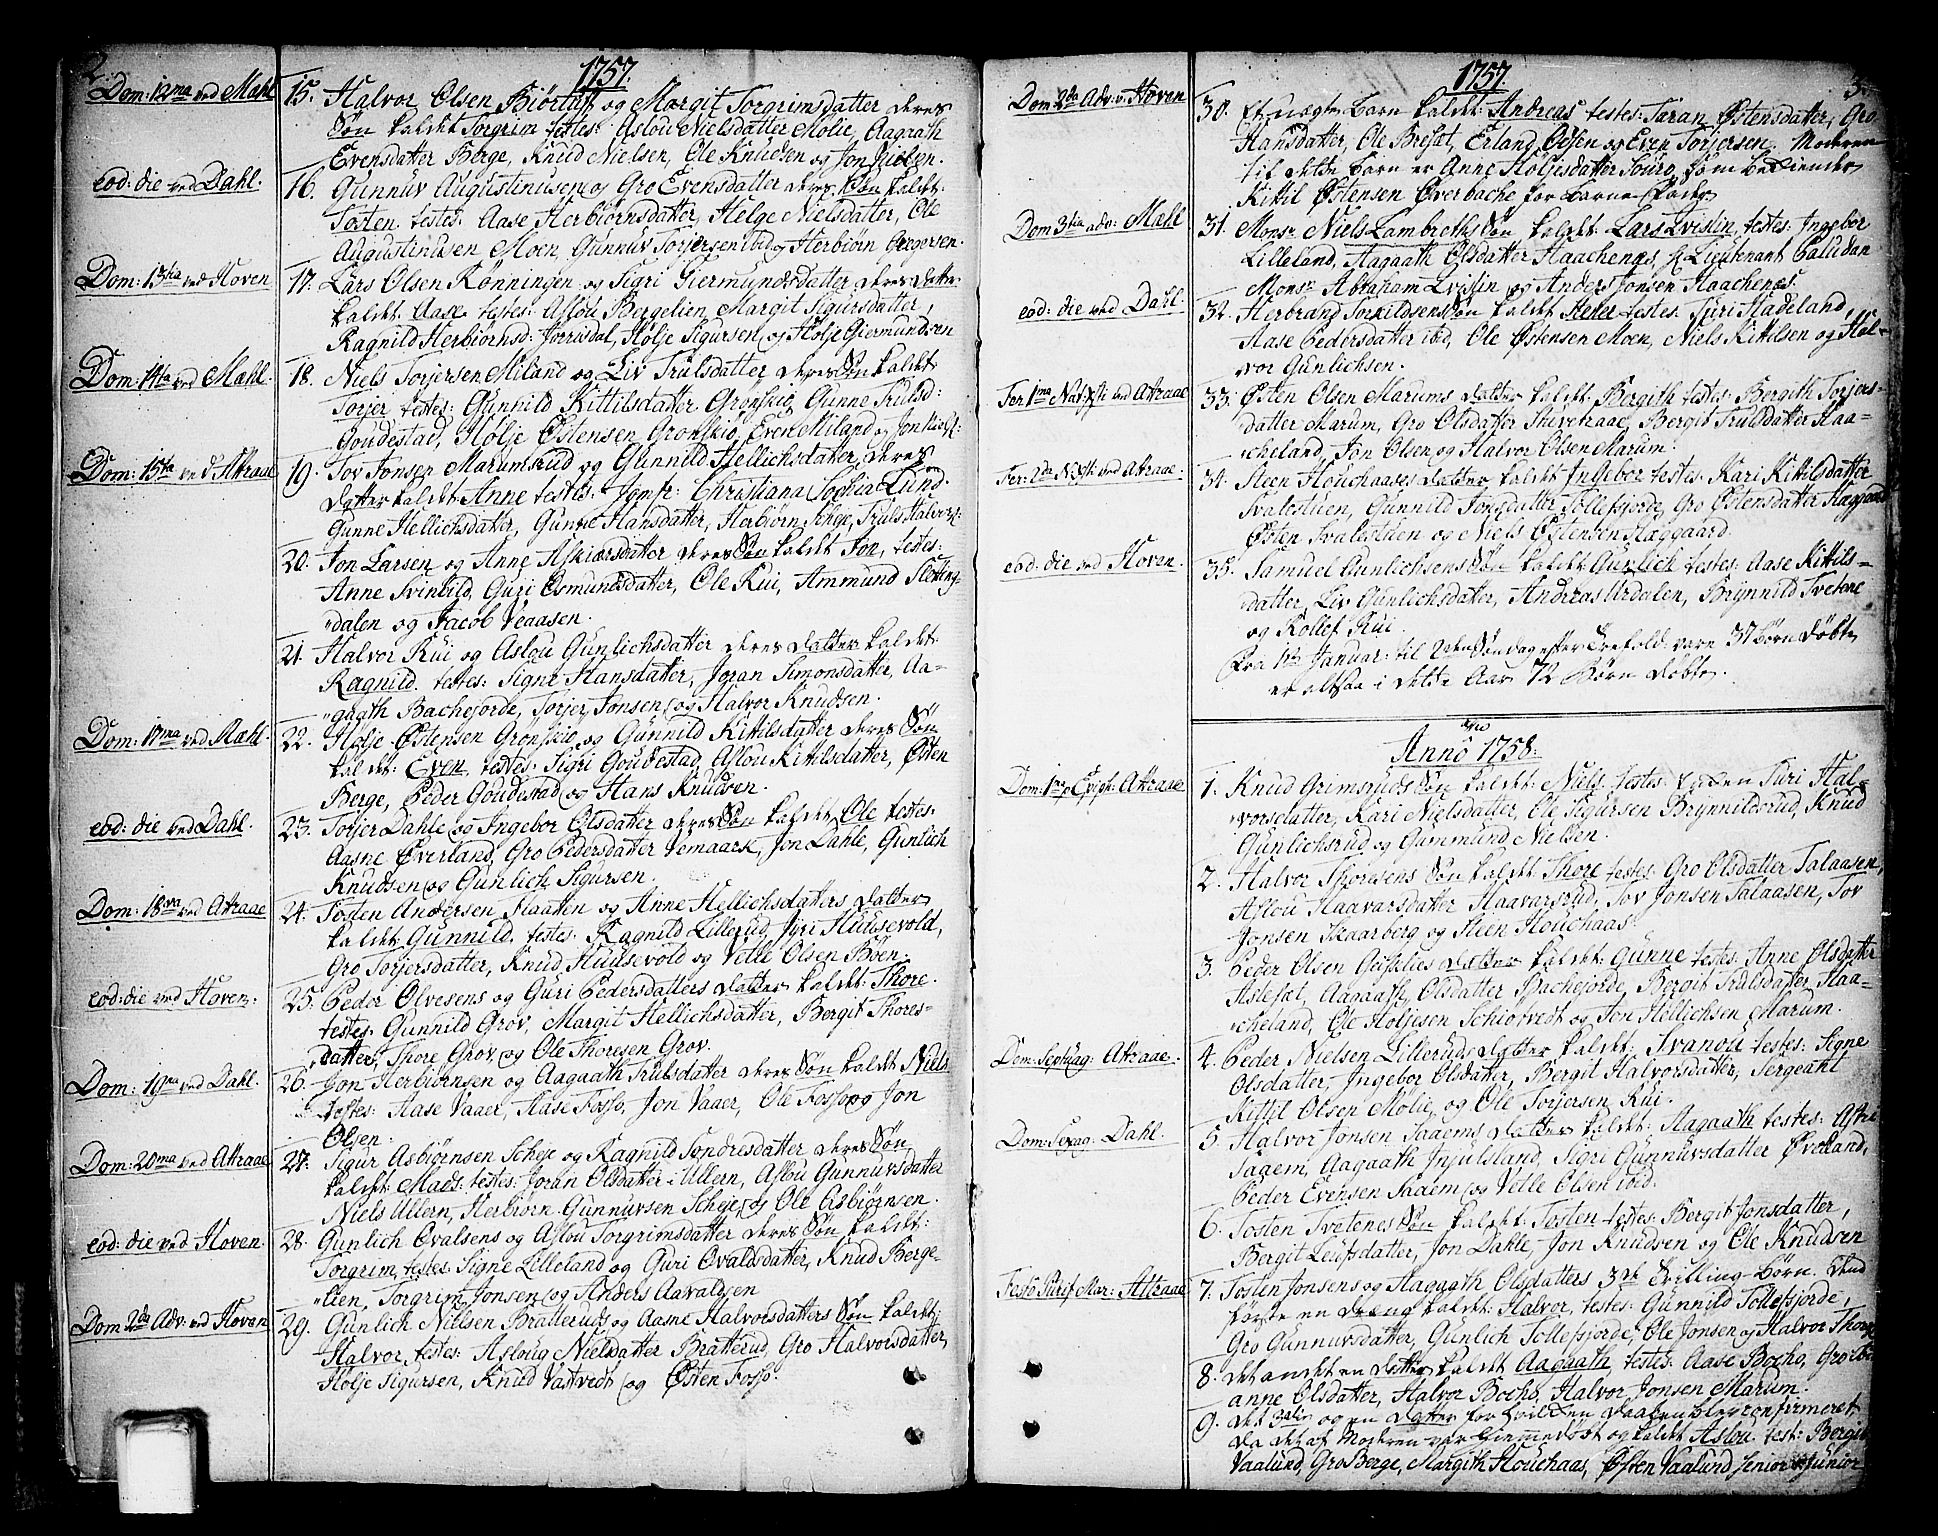 SAKO, Tinn kirkebøker, F/Fa/L0002: Ministerialbok nr. I 2, 1757-1810, s. 2-3